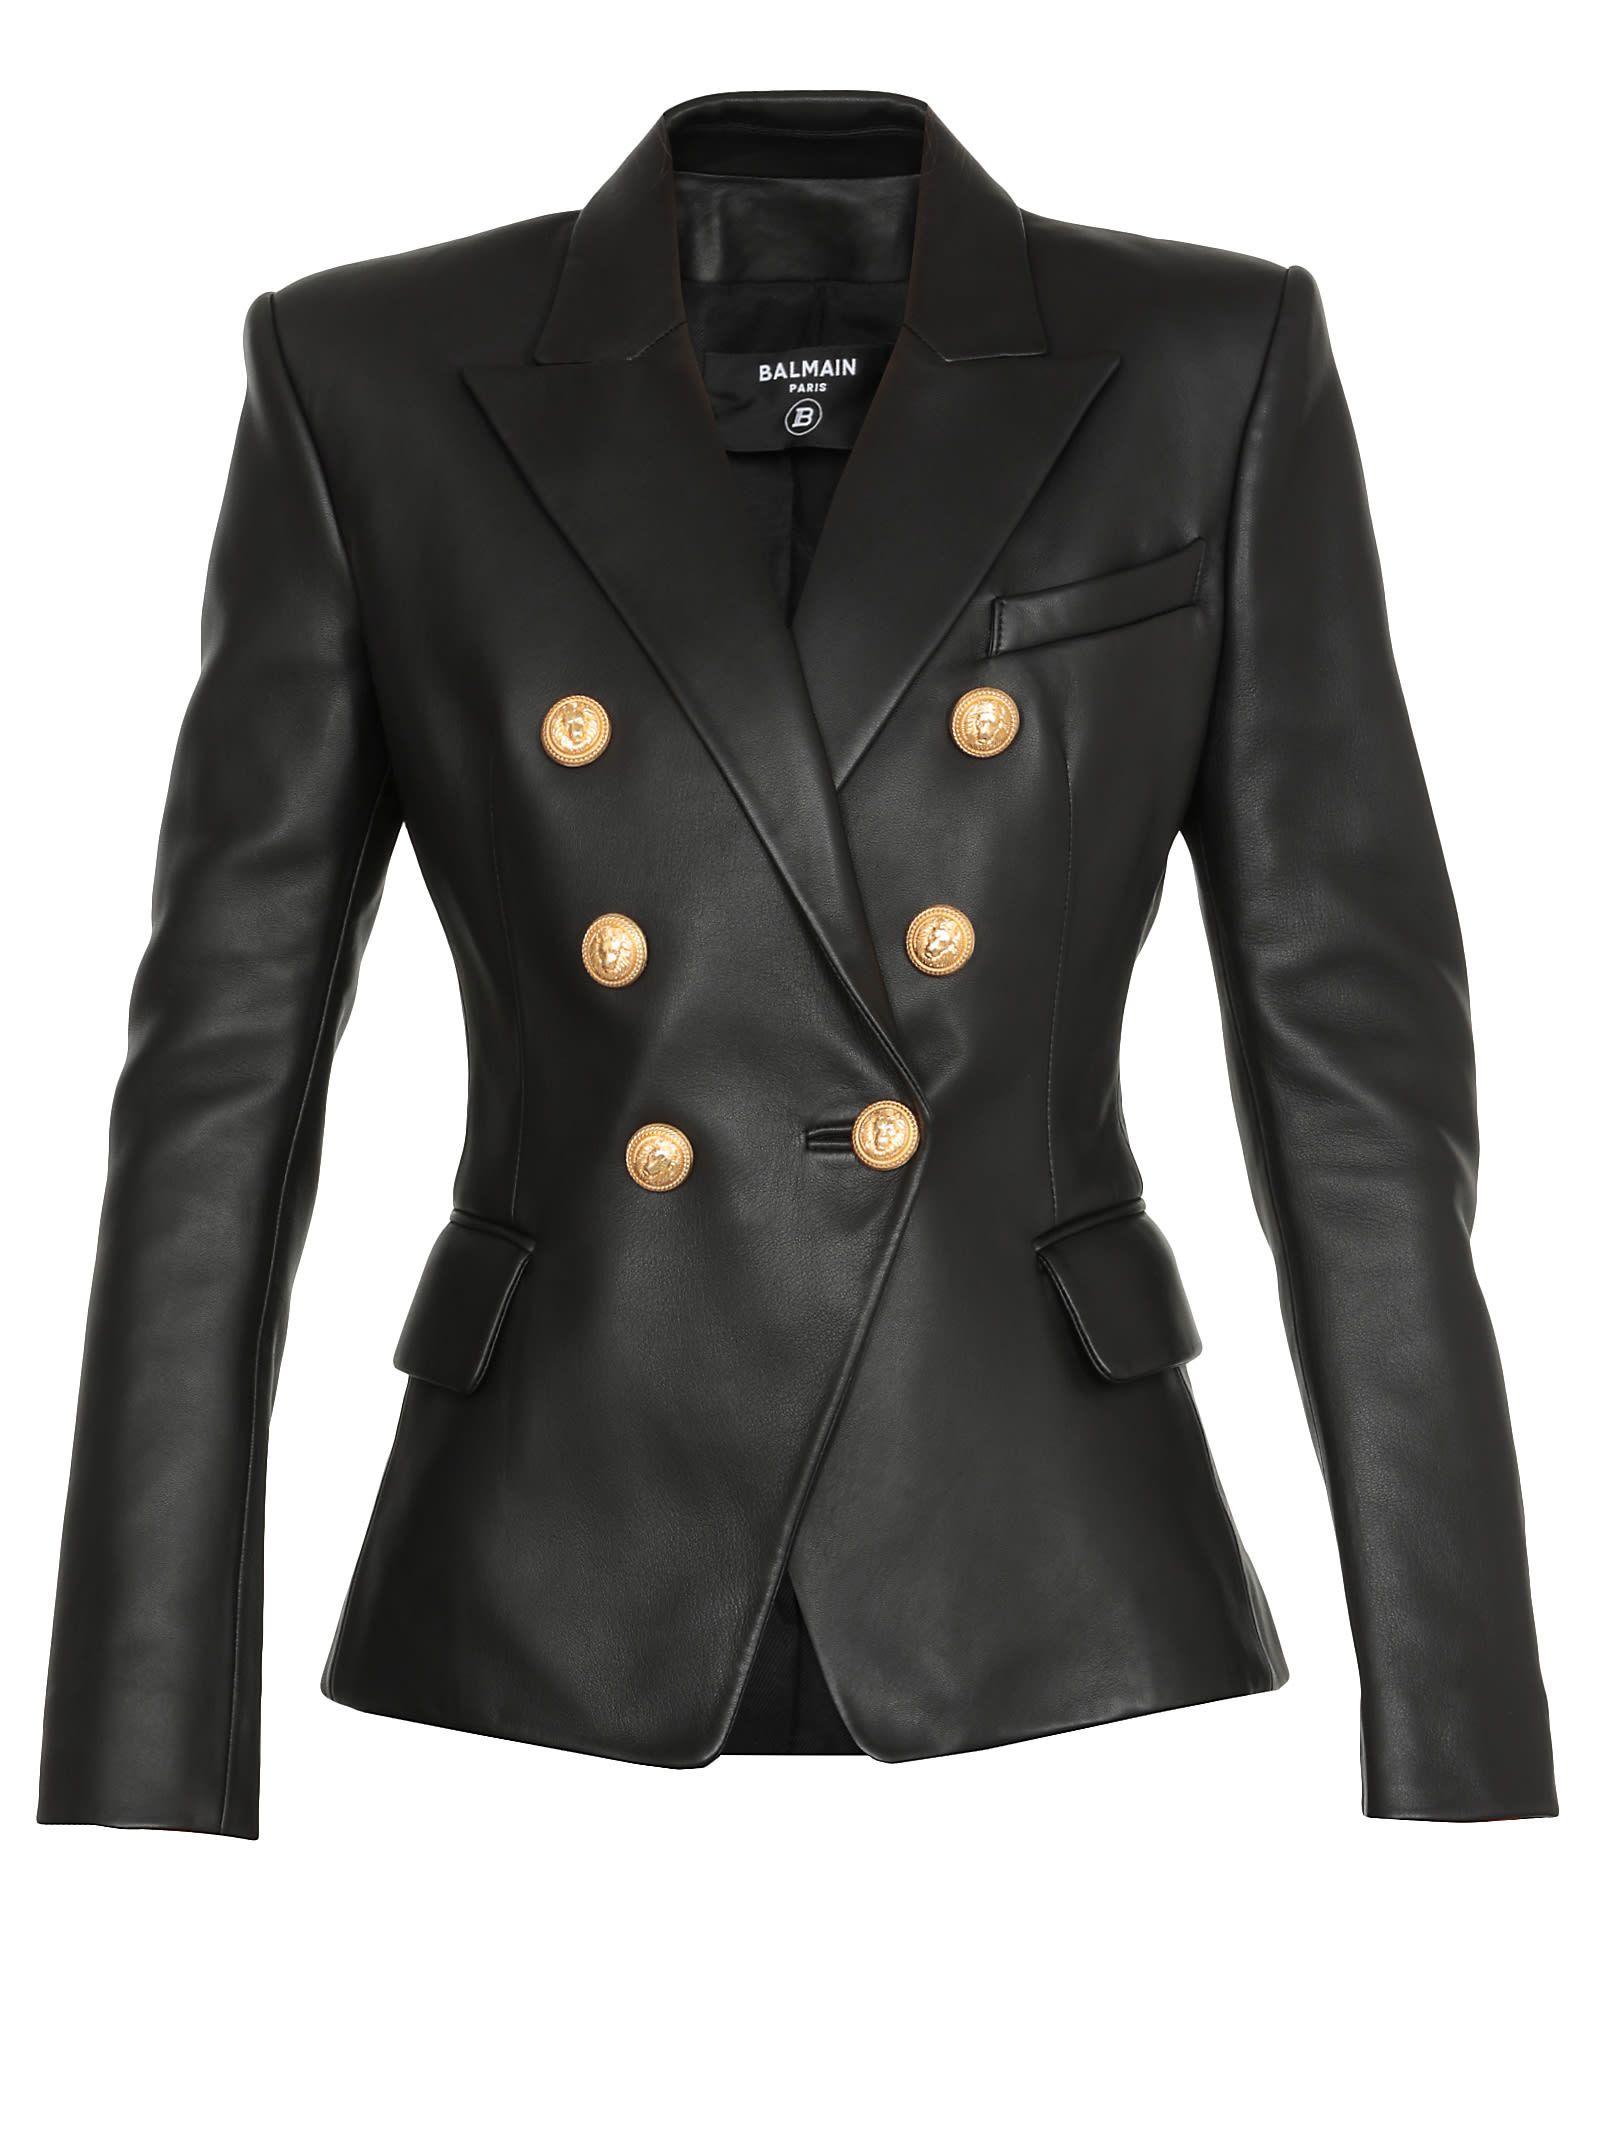 Balmain Double Breasted Leather Blazer In Black Modesens Balmain Leather Jacket Balmain Blazer Outfits Leather Blazer Women [ 2136 x 1600 Pixel ]